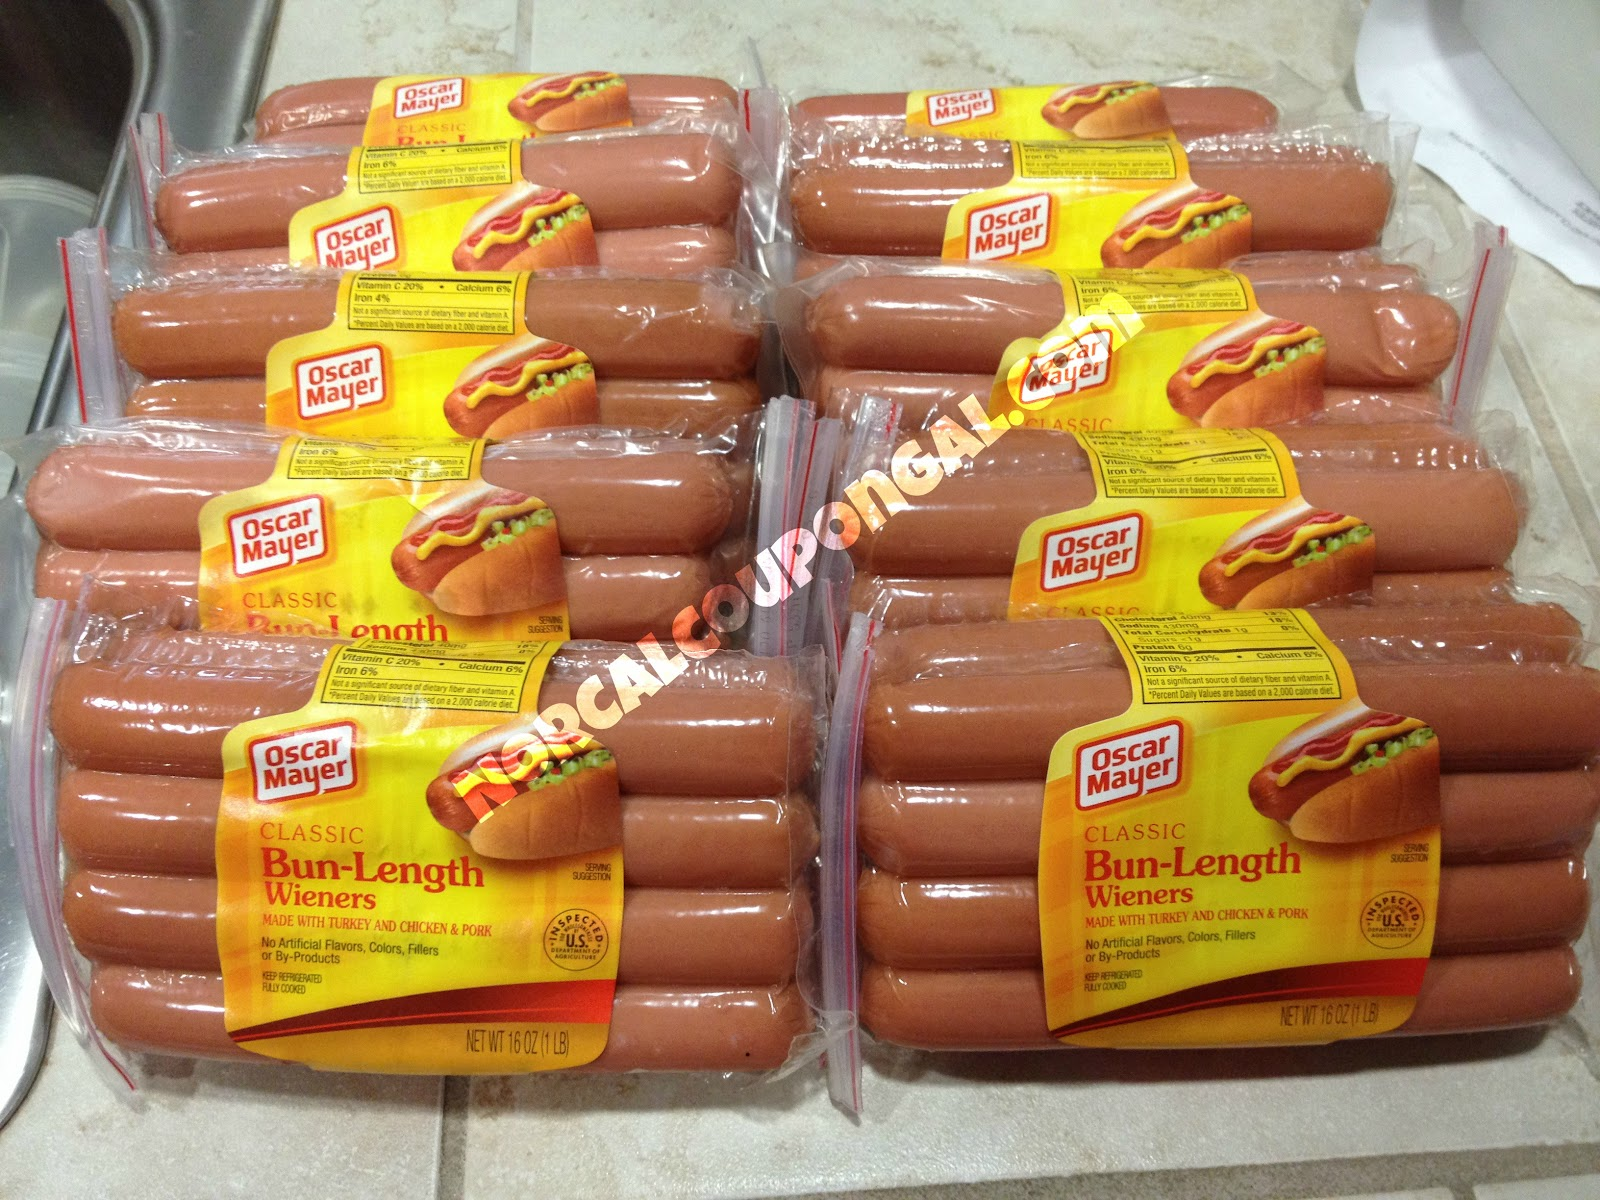 Where can i buy thumann's hot dogs besides Jumbo Hot Dog gGglXEdKx CaUbiPvdH1NB1FeqaRyowOlwjvpHsa8w0 likewise B3NjYXIgbWF5ZXIgaG90IGRvZ3M also B3NjYXIgbWF5ZXIgaG90IGRvZw in addition 481. on oscar mayer dogs wholesale